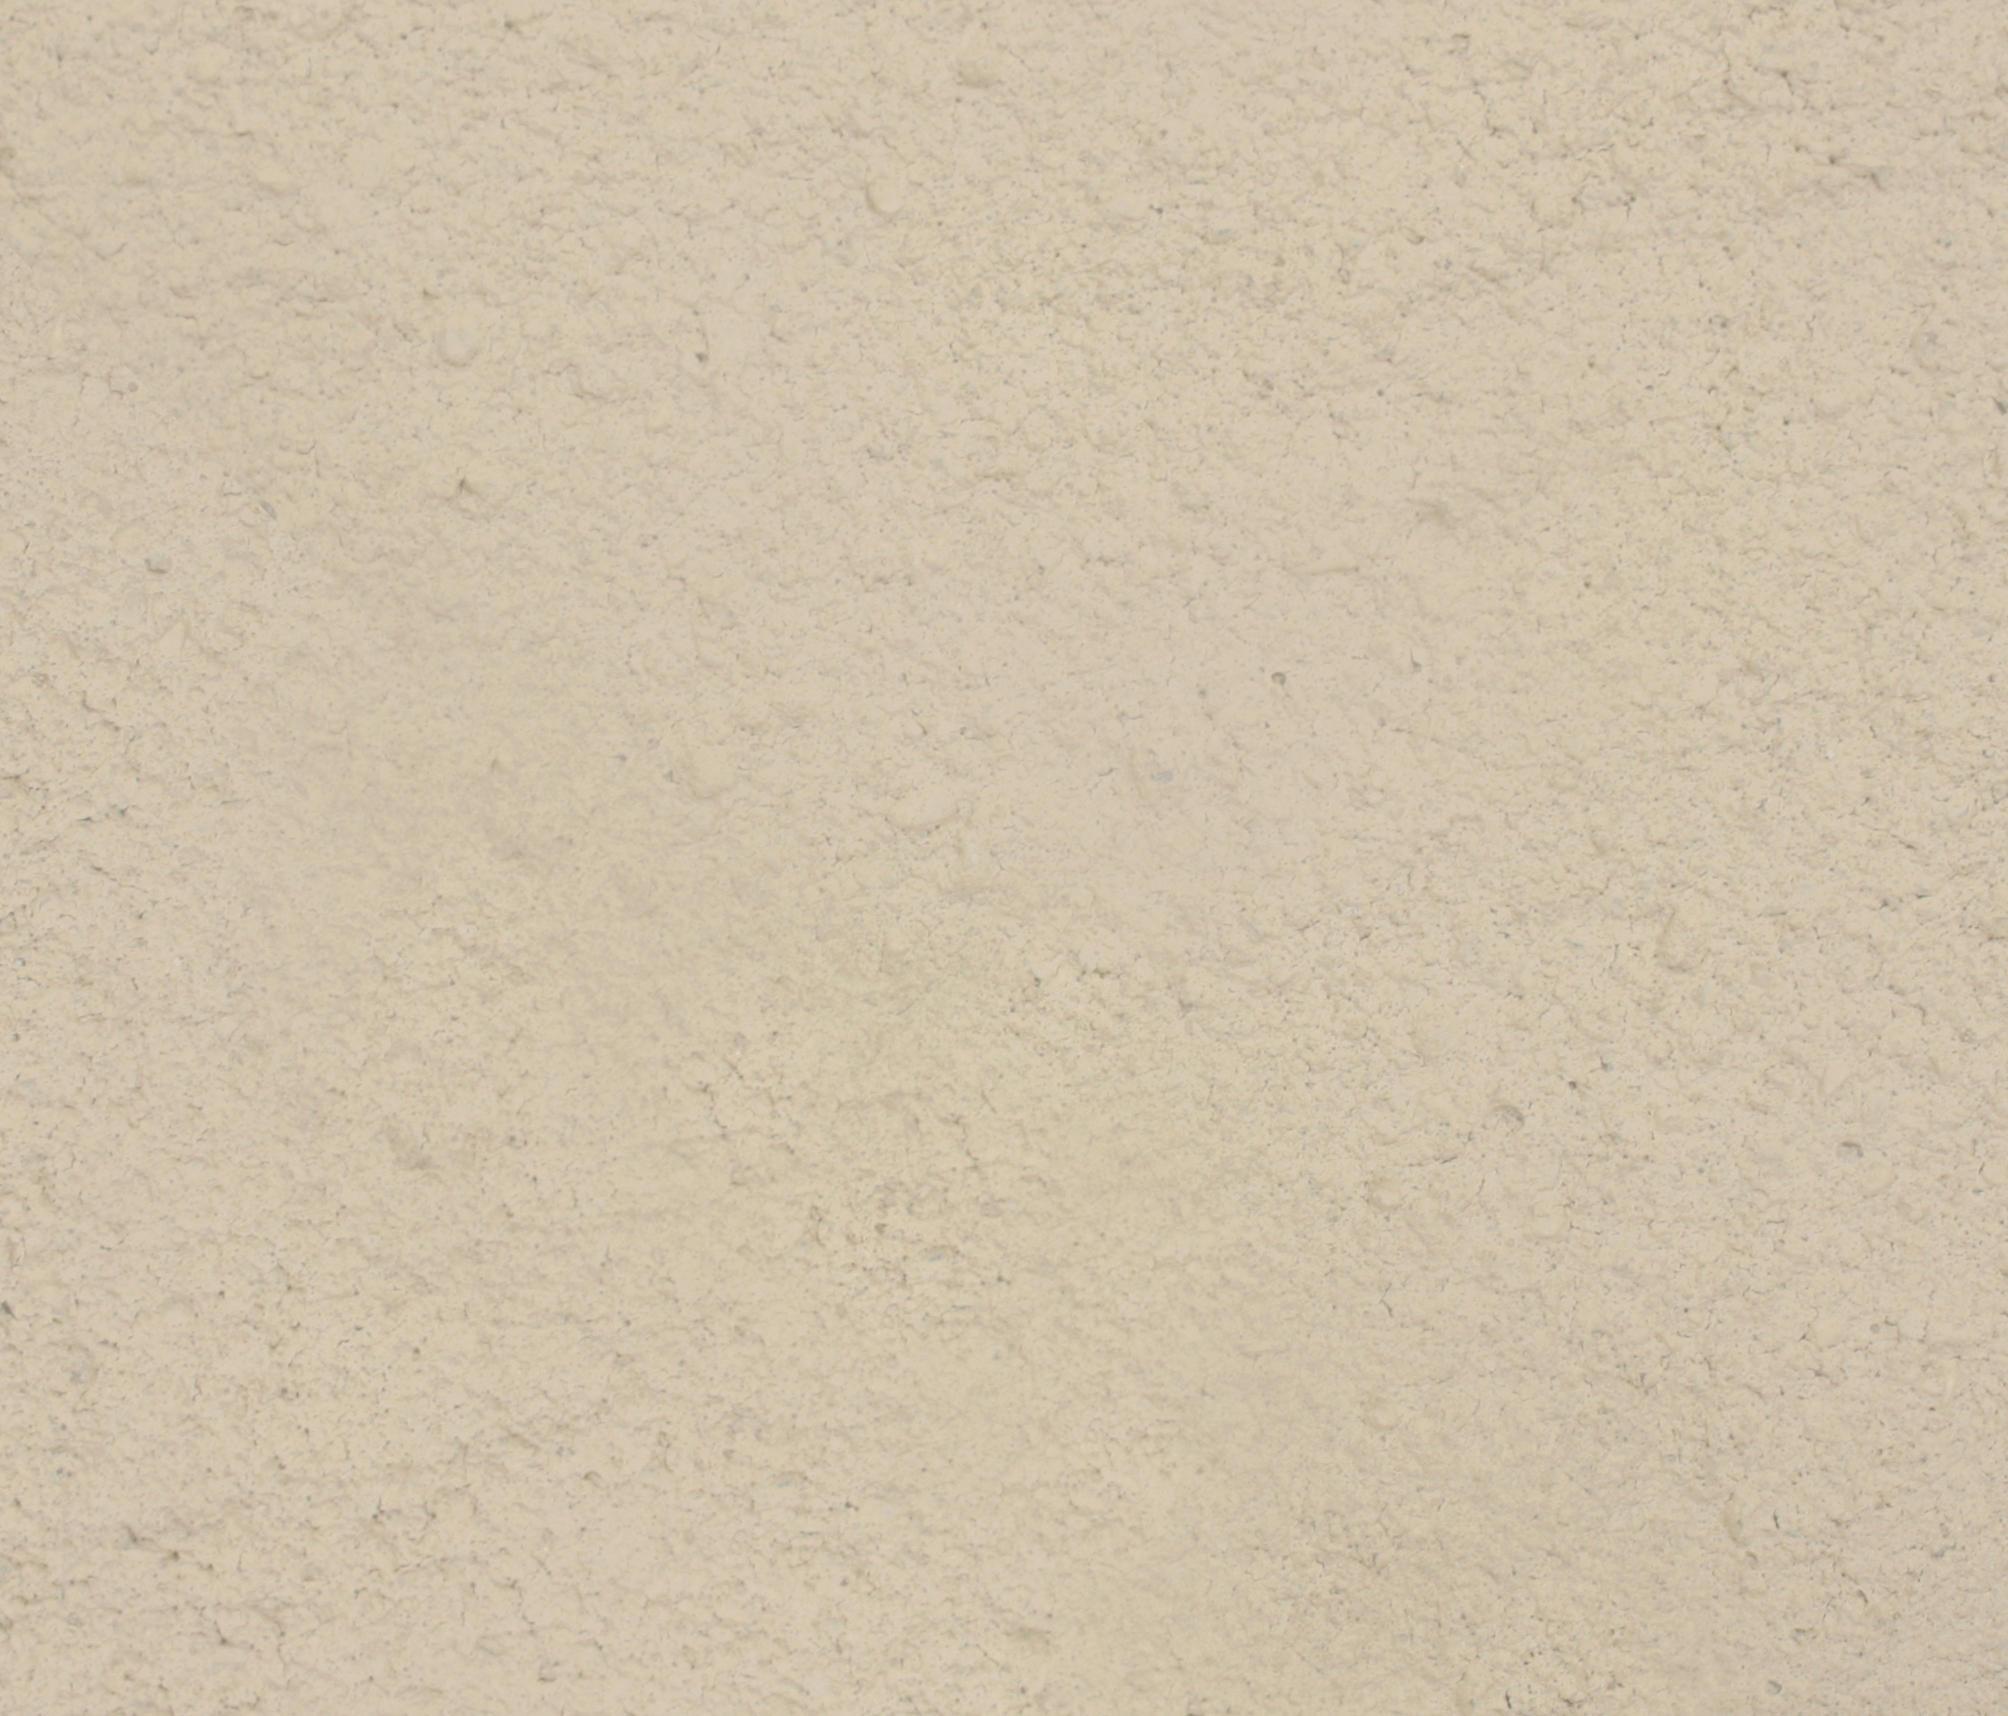 Multiterra cannella clay plaster from matteo brioni for Matteo brioni